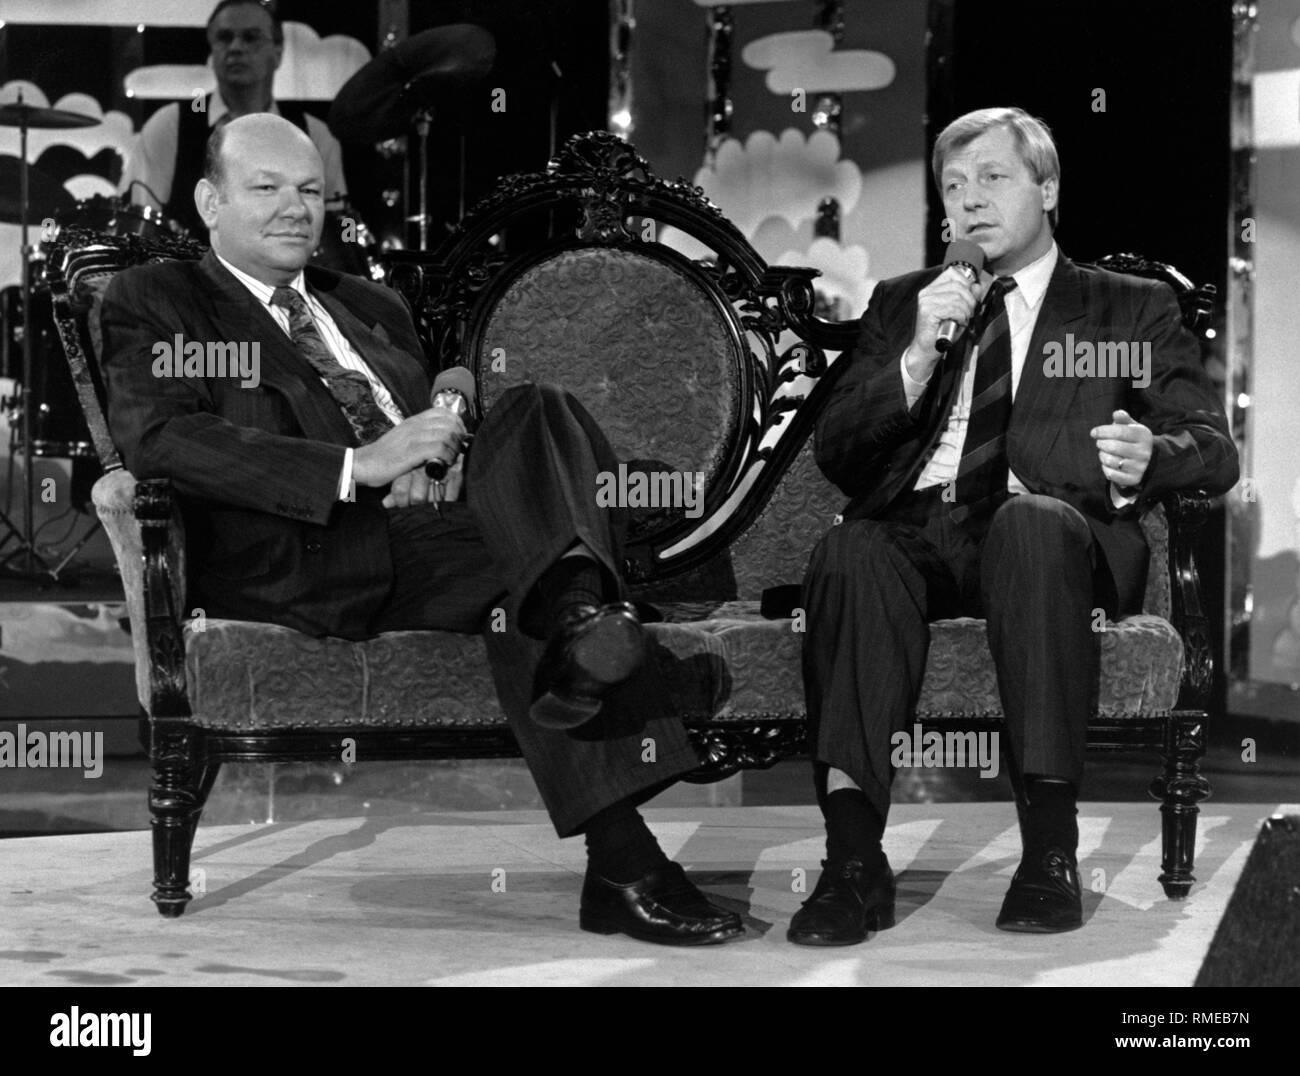 Walter Momper and Eberhard Diepgen on a talk show. - Stock Image